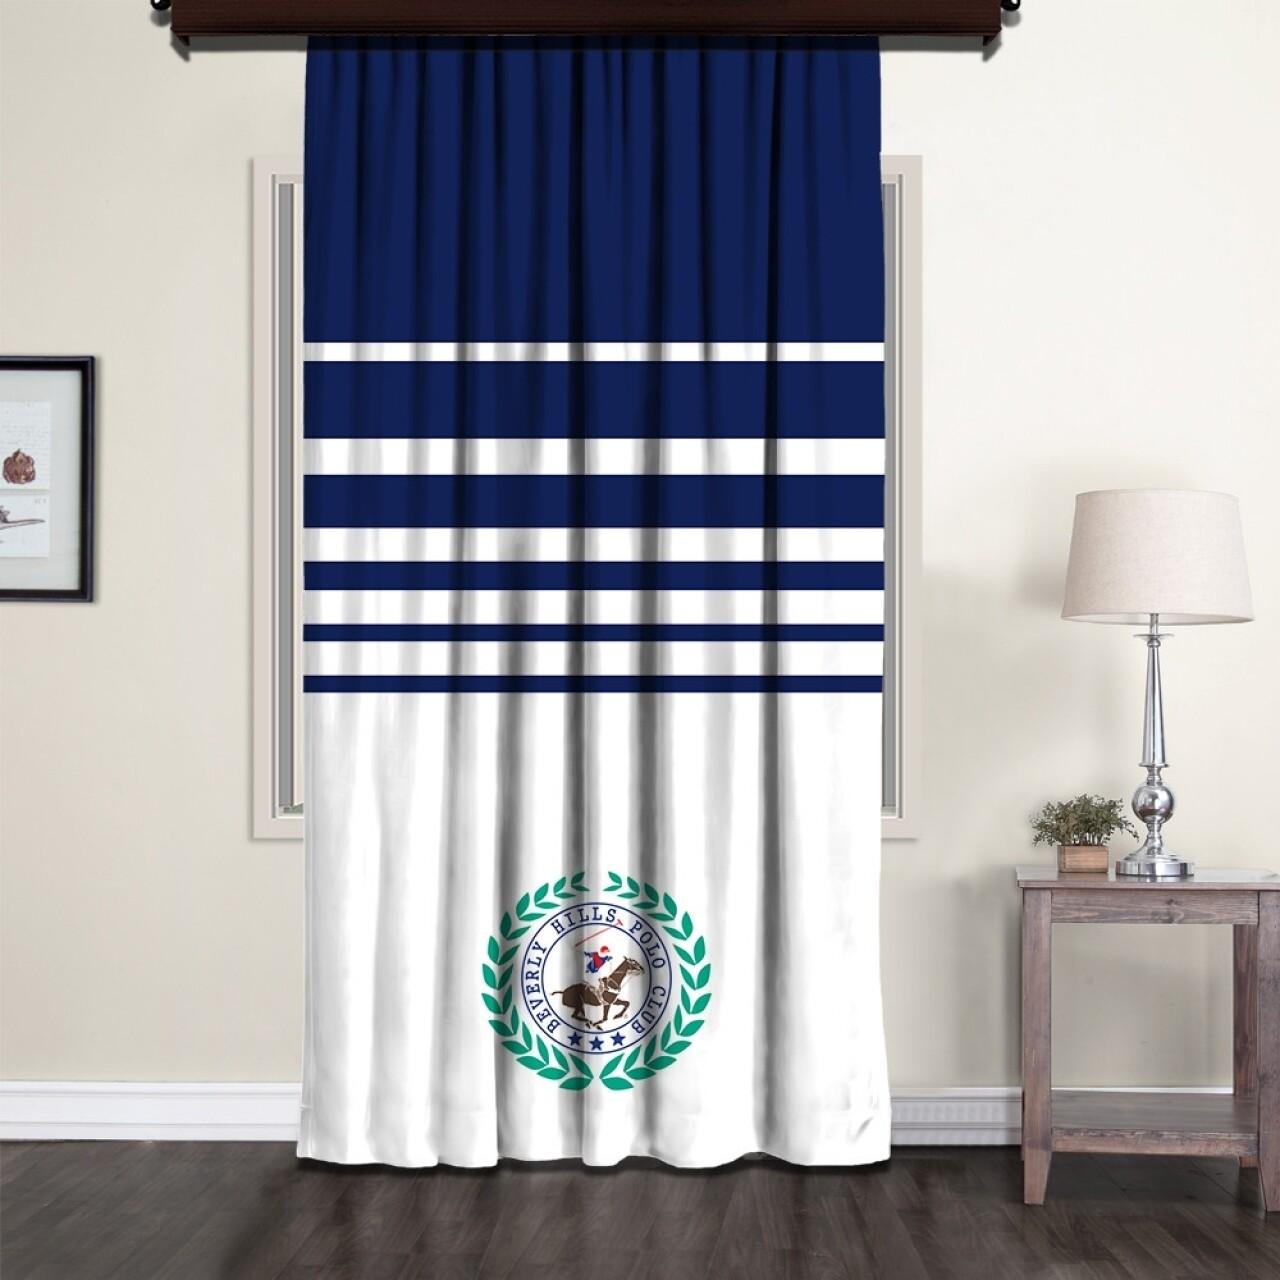 Draperie Beverly Hills Polo Club, Crt 10-1, 140x260, 100% poliester, alb/albastru